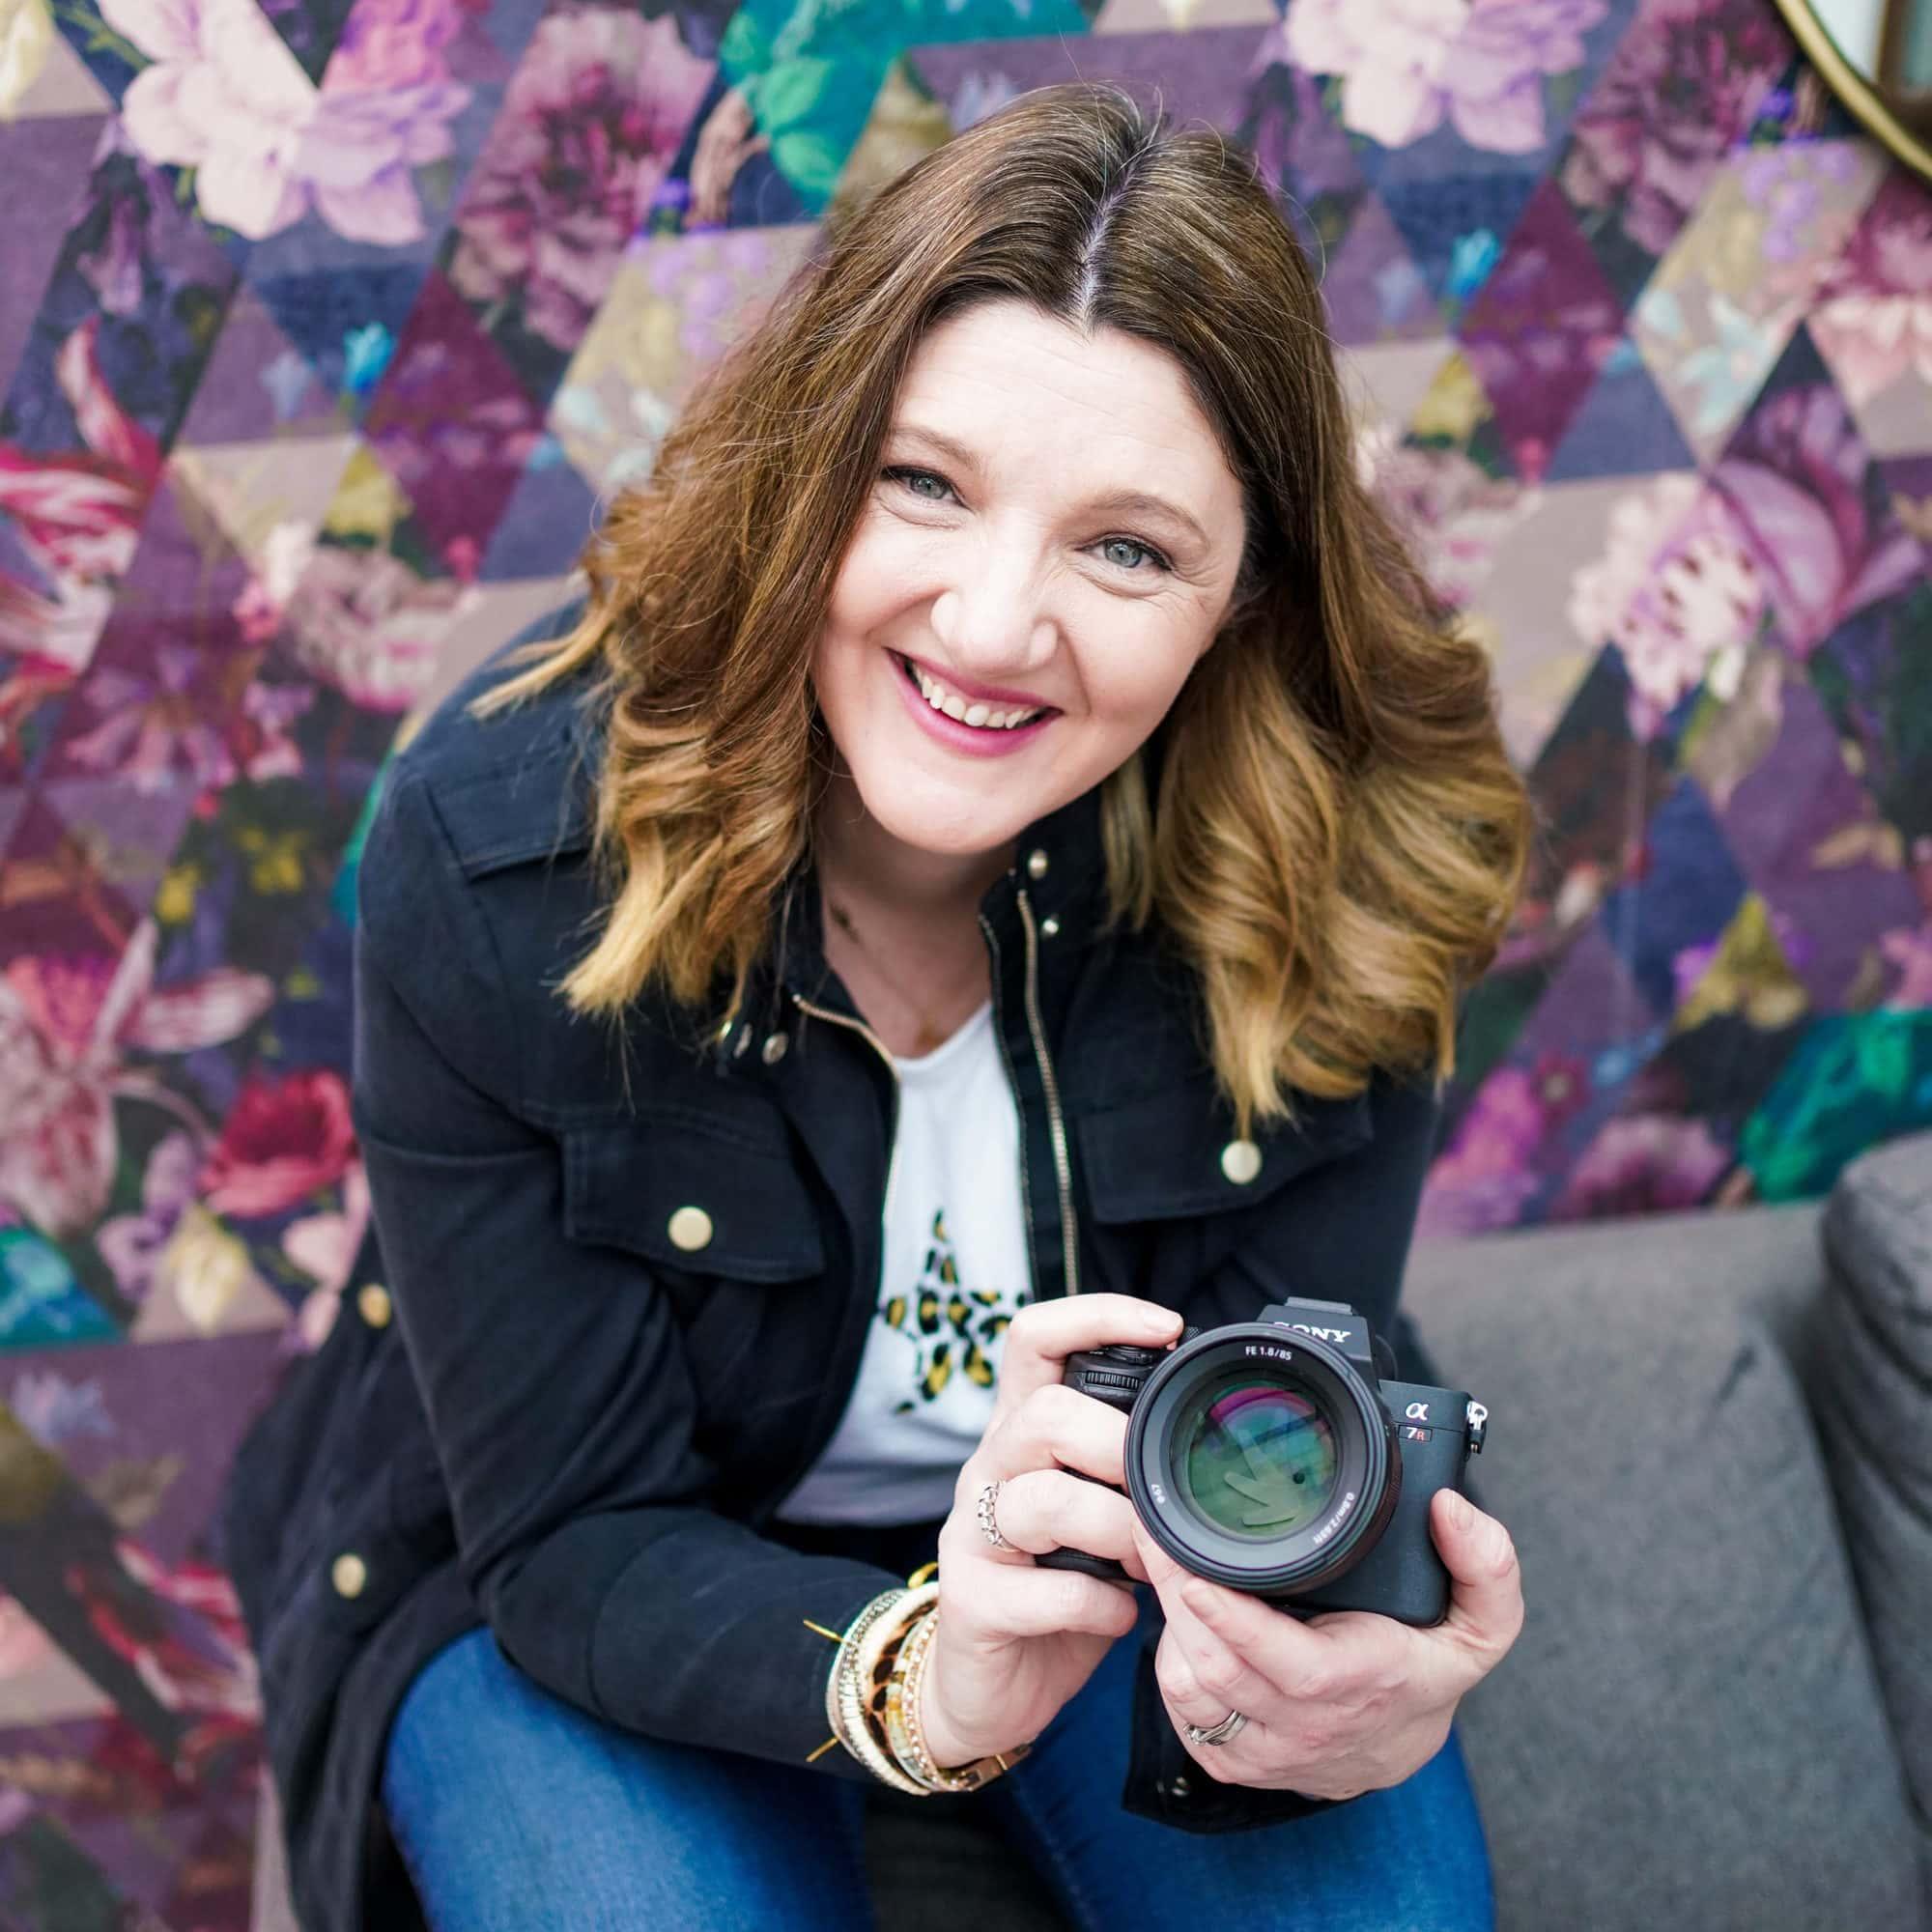 Photography mentorship